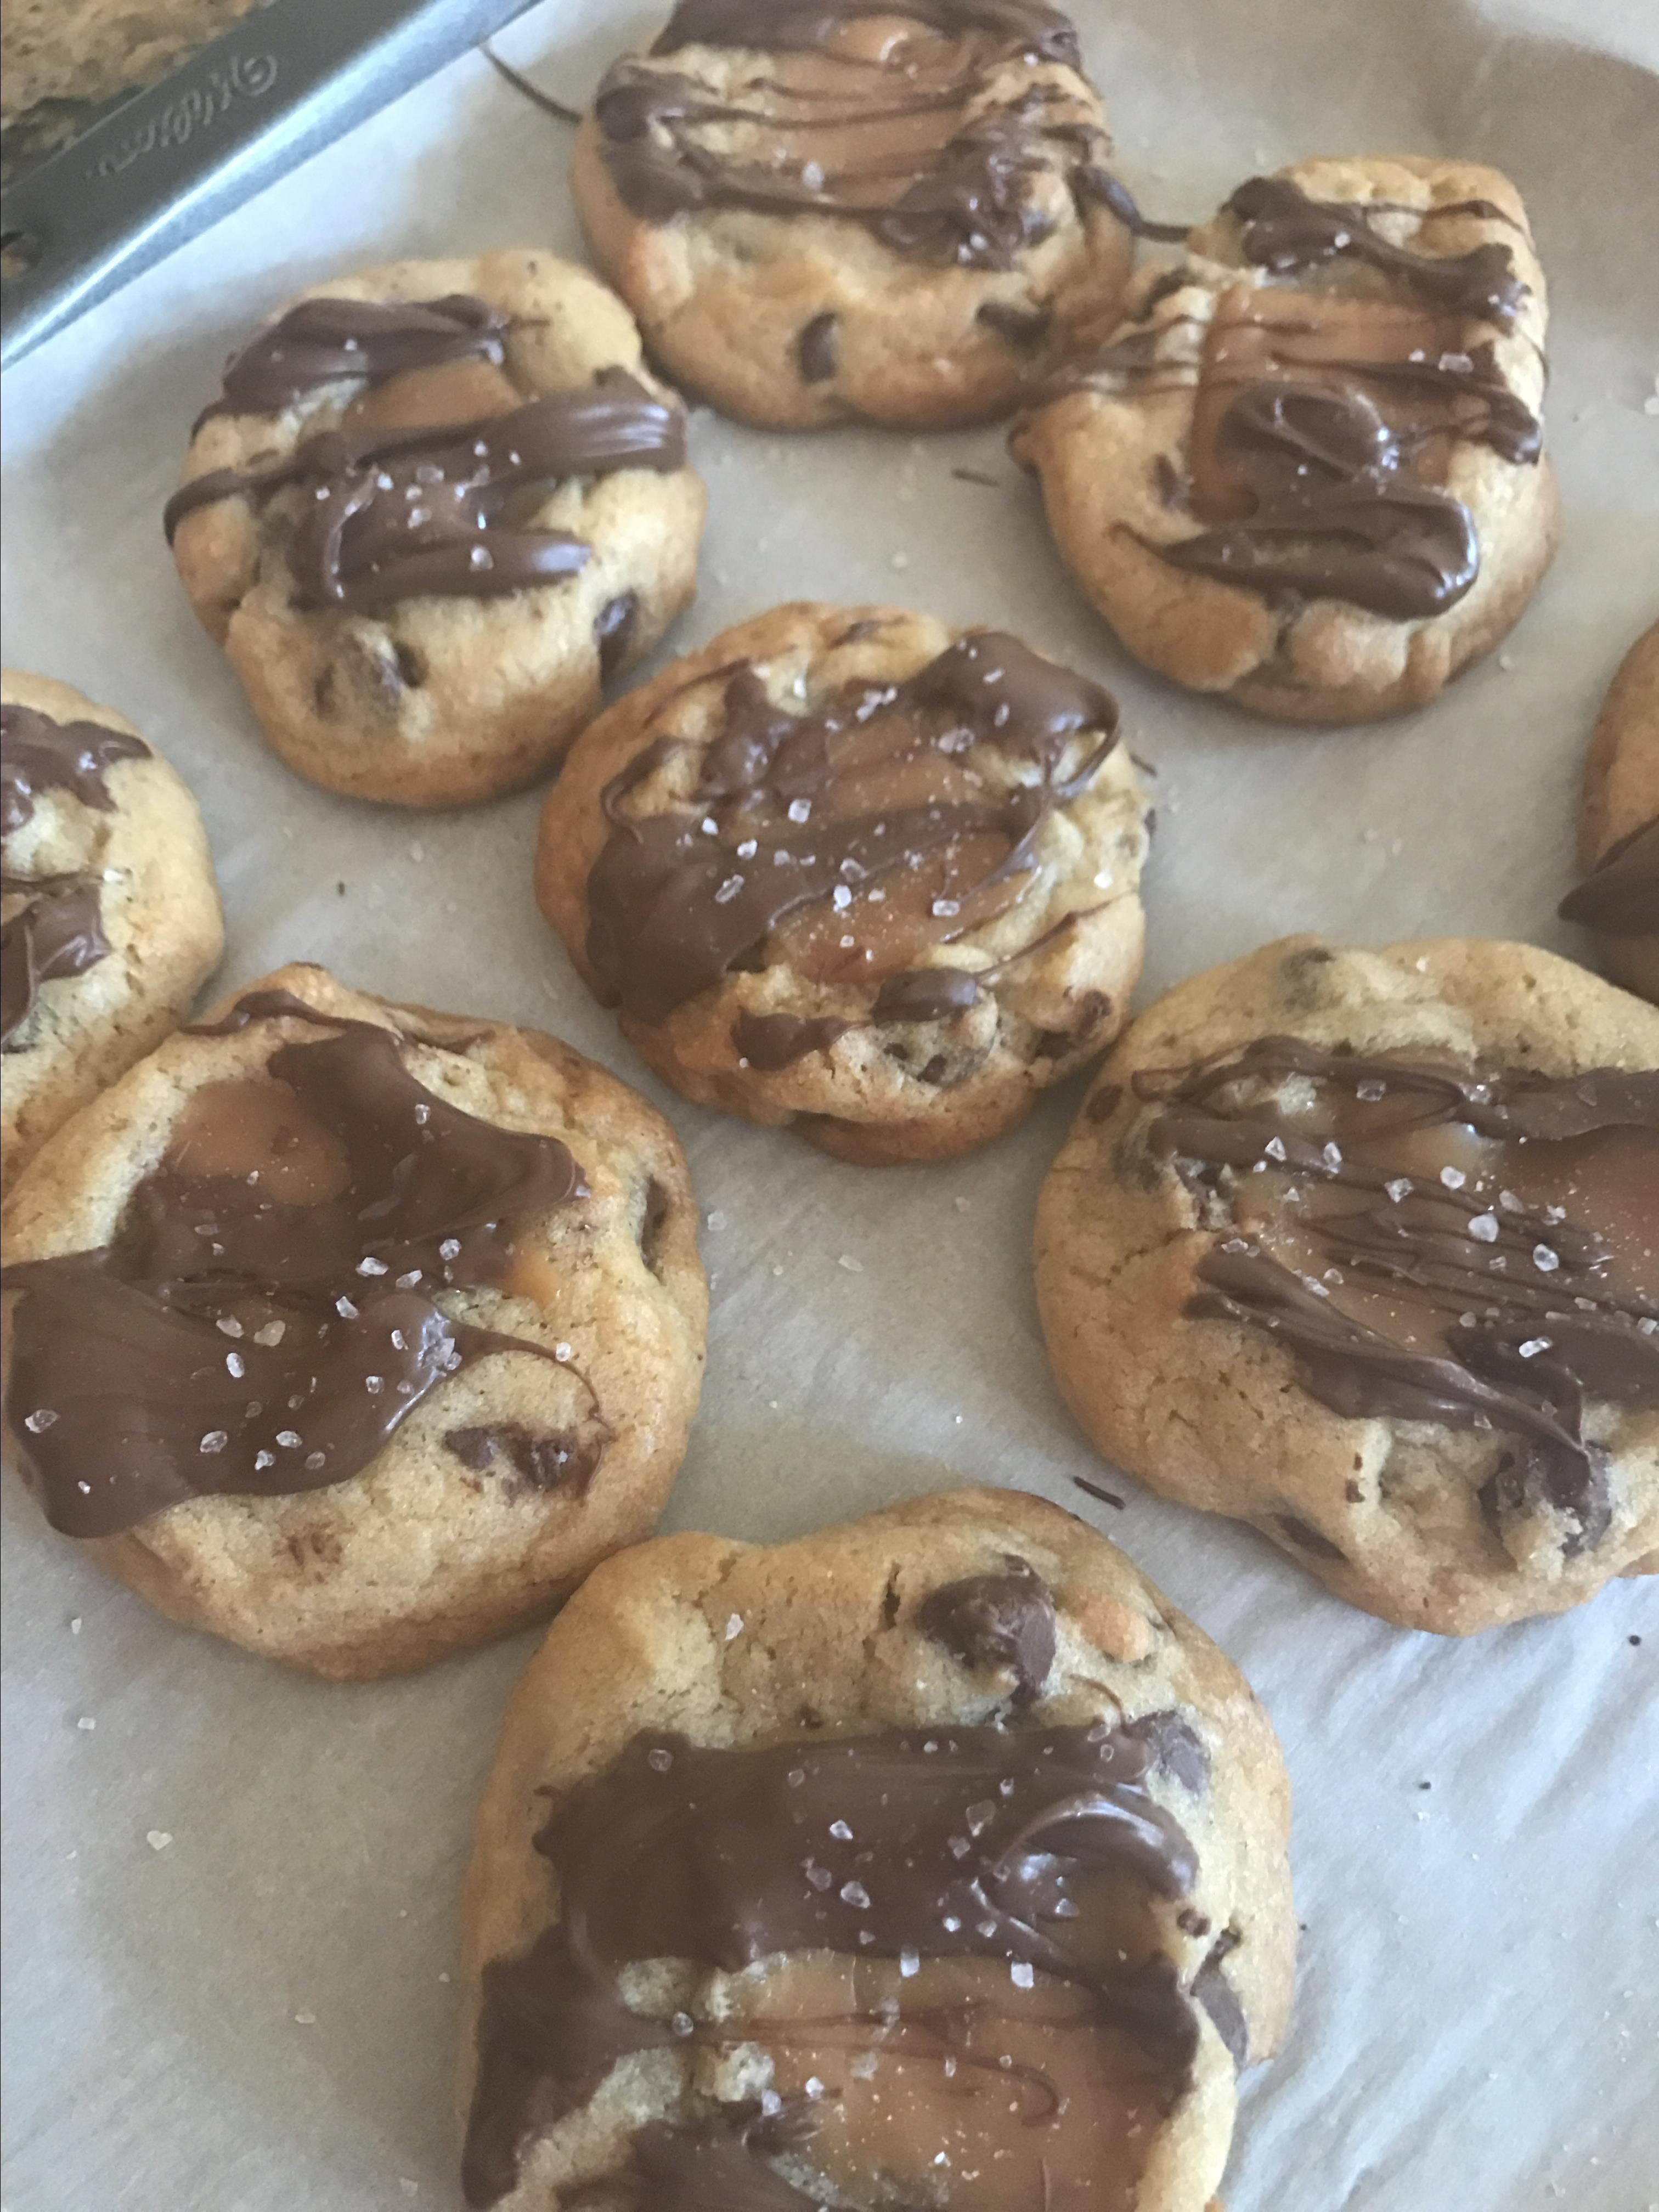 Salted Caramel Chocolate Chip Cookies from Pillsbury® Heather